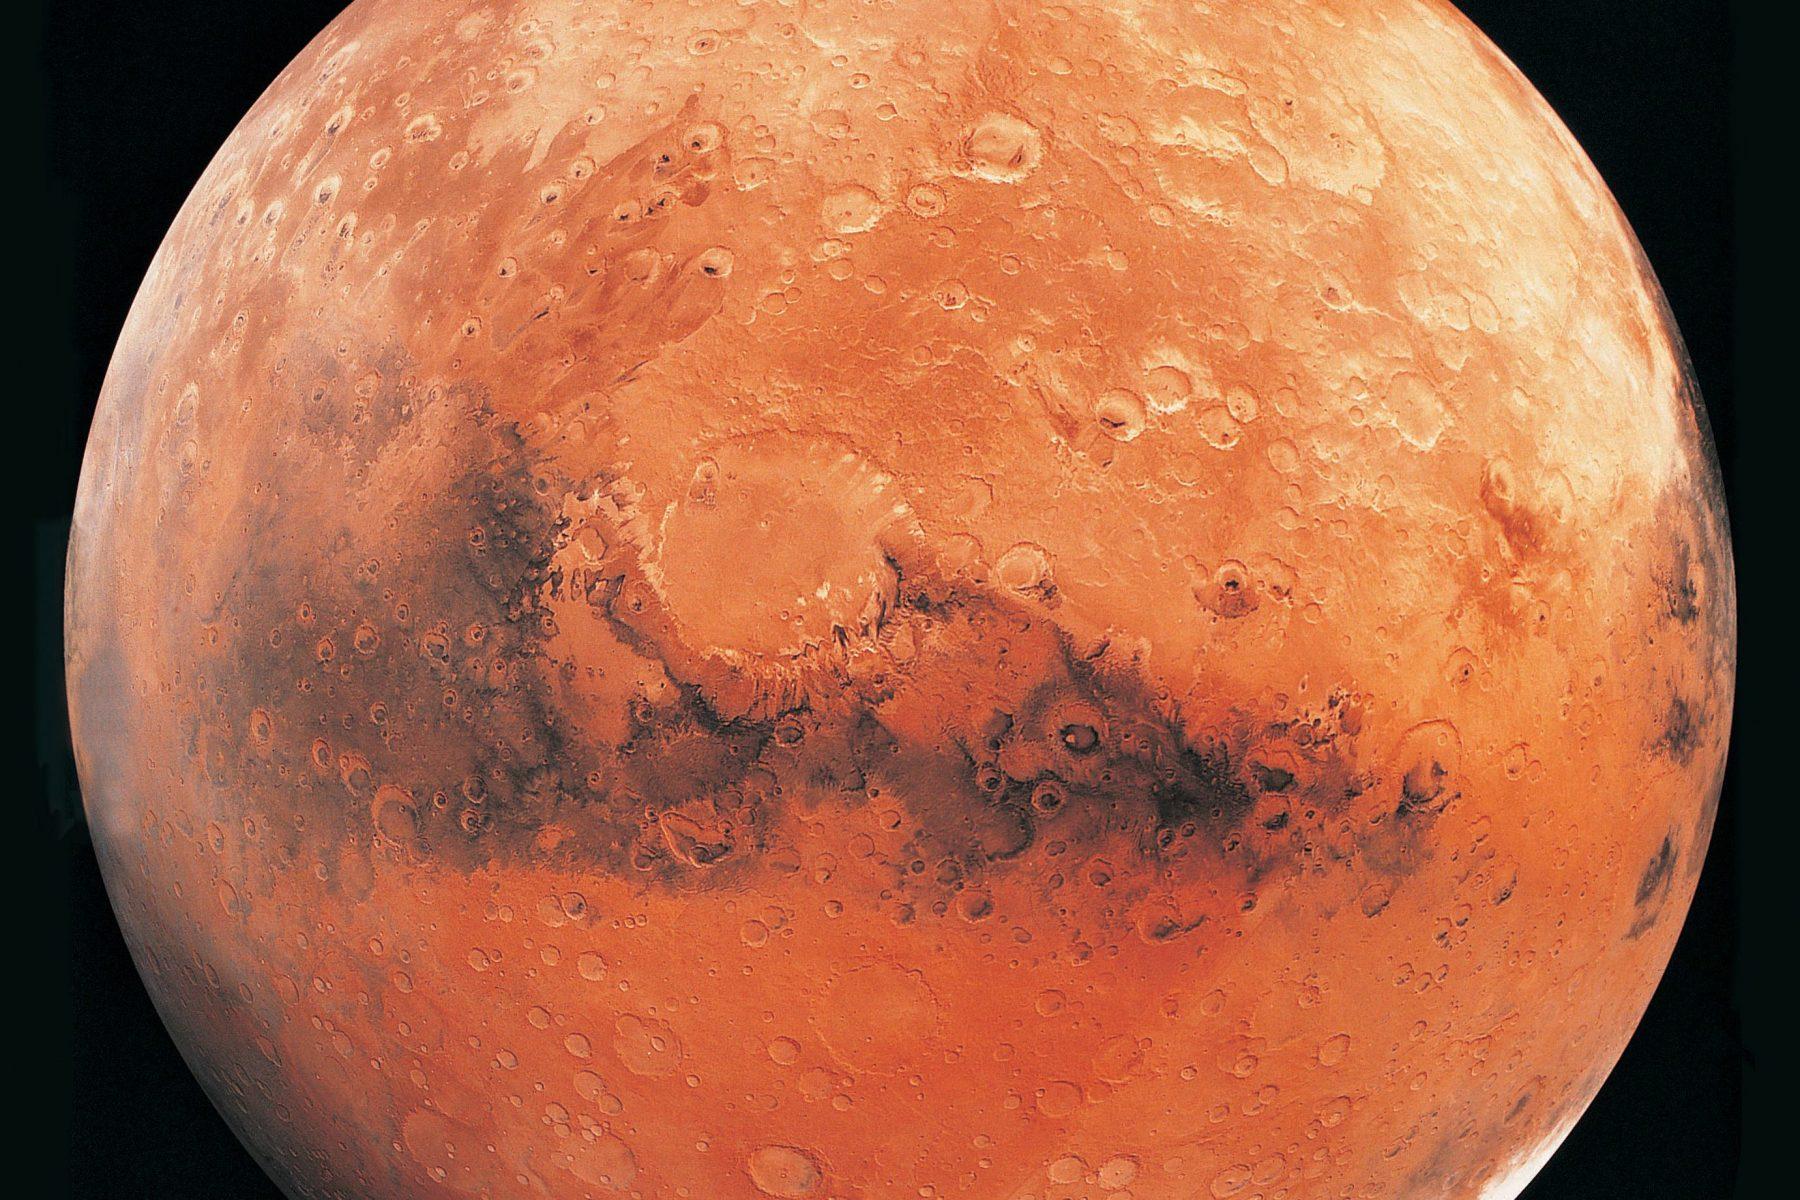 Methane gas on Mars